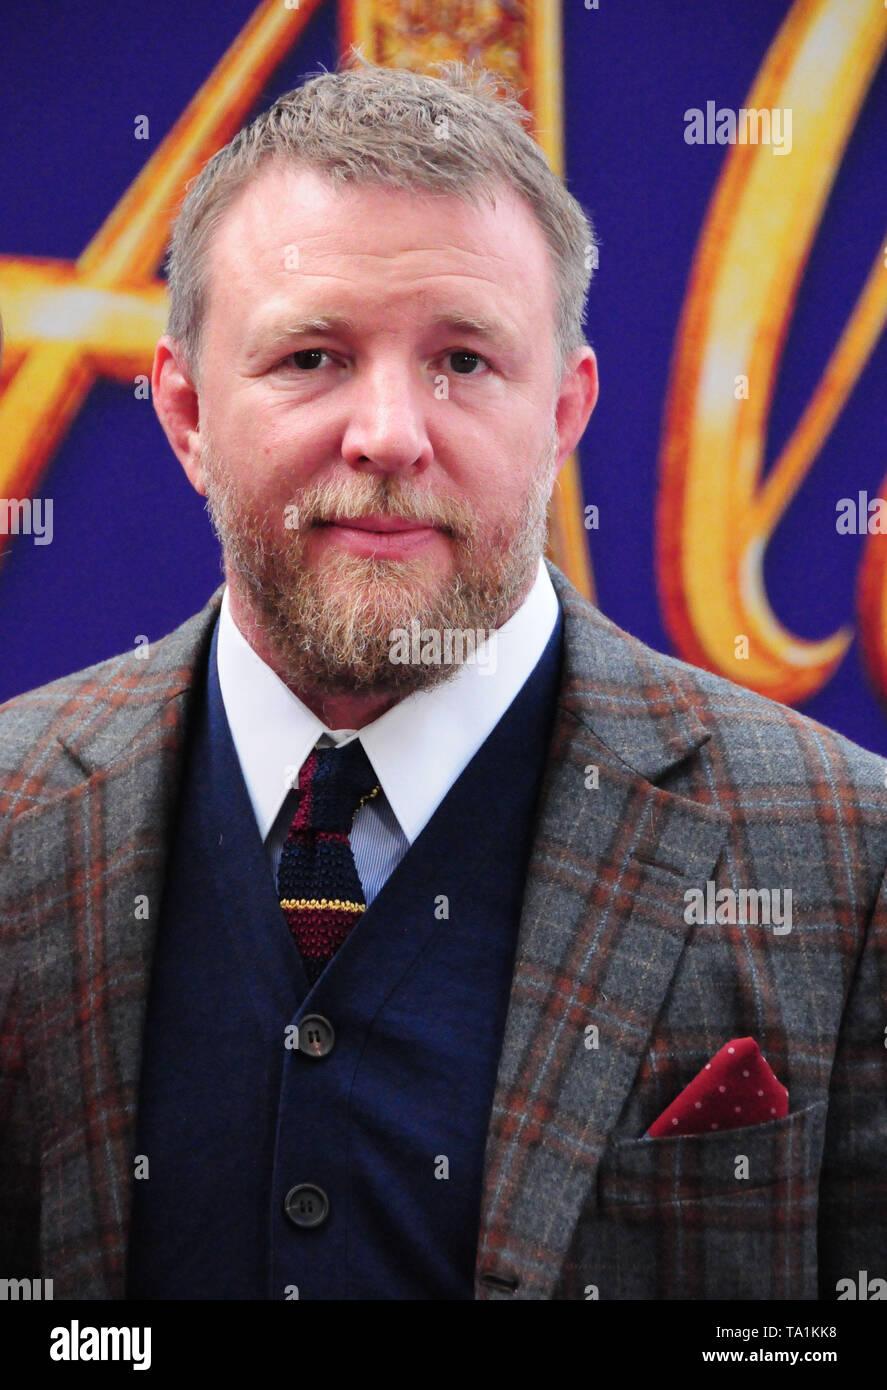 Aladdín (Guy Ritchie, 2019)